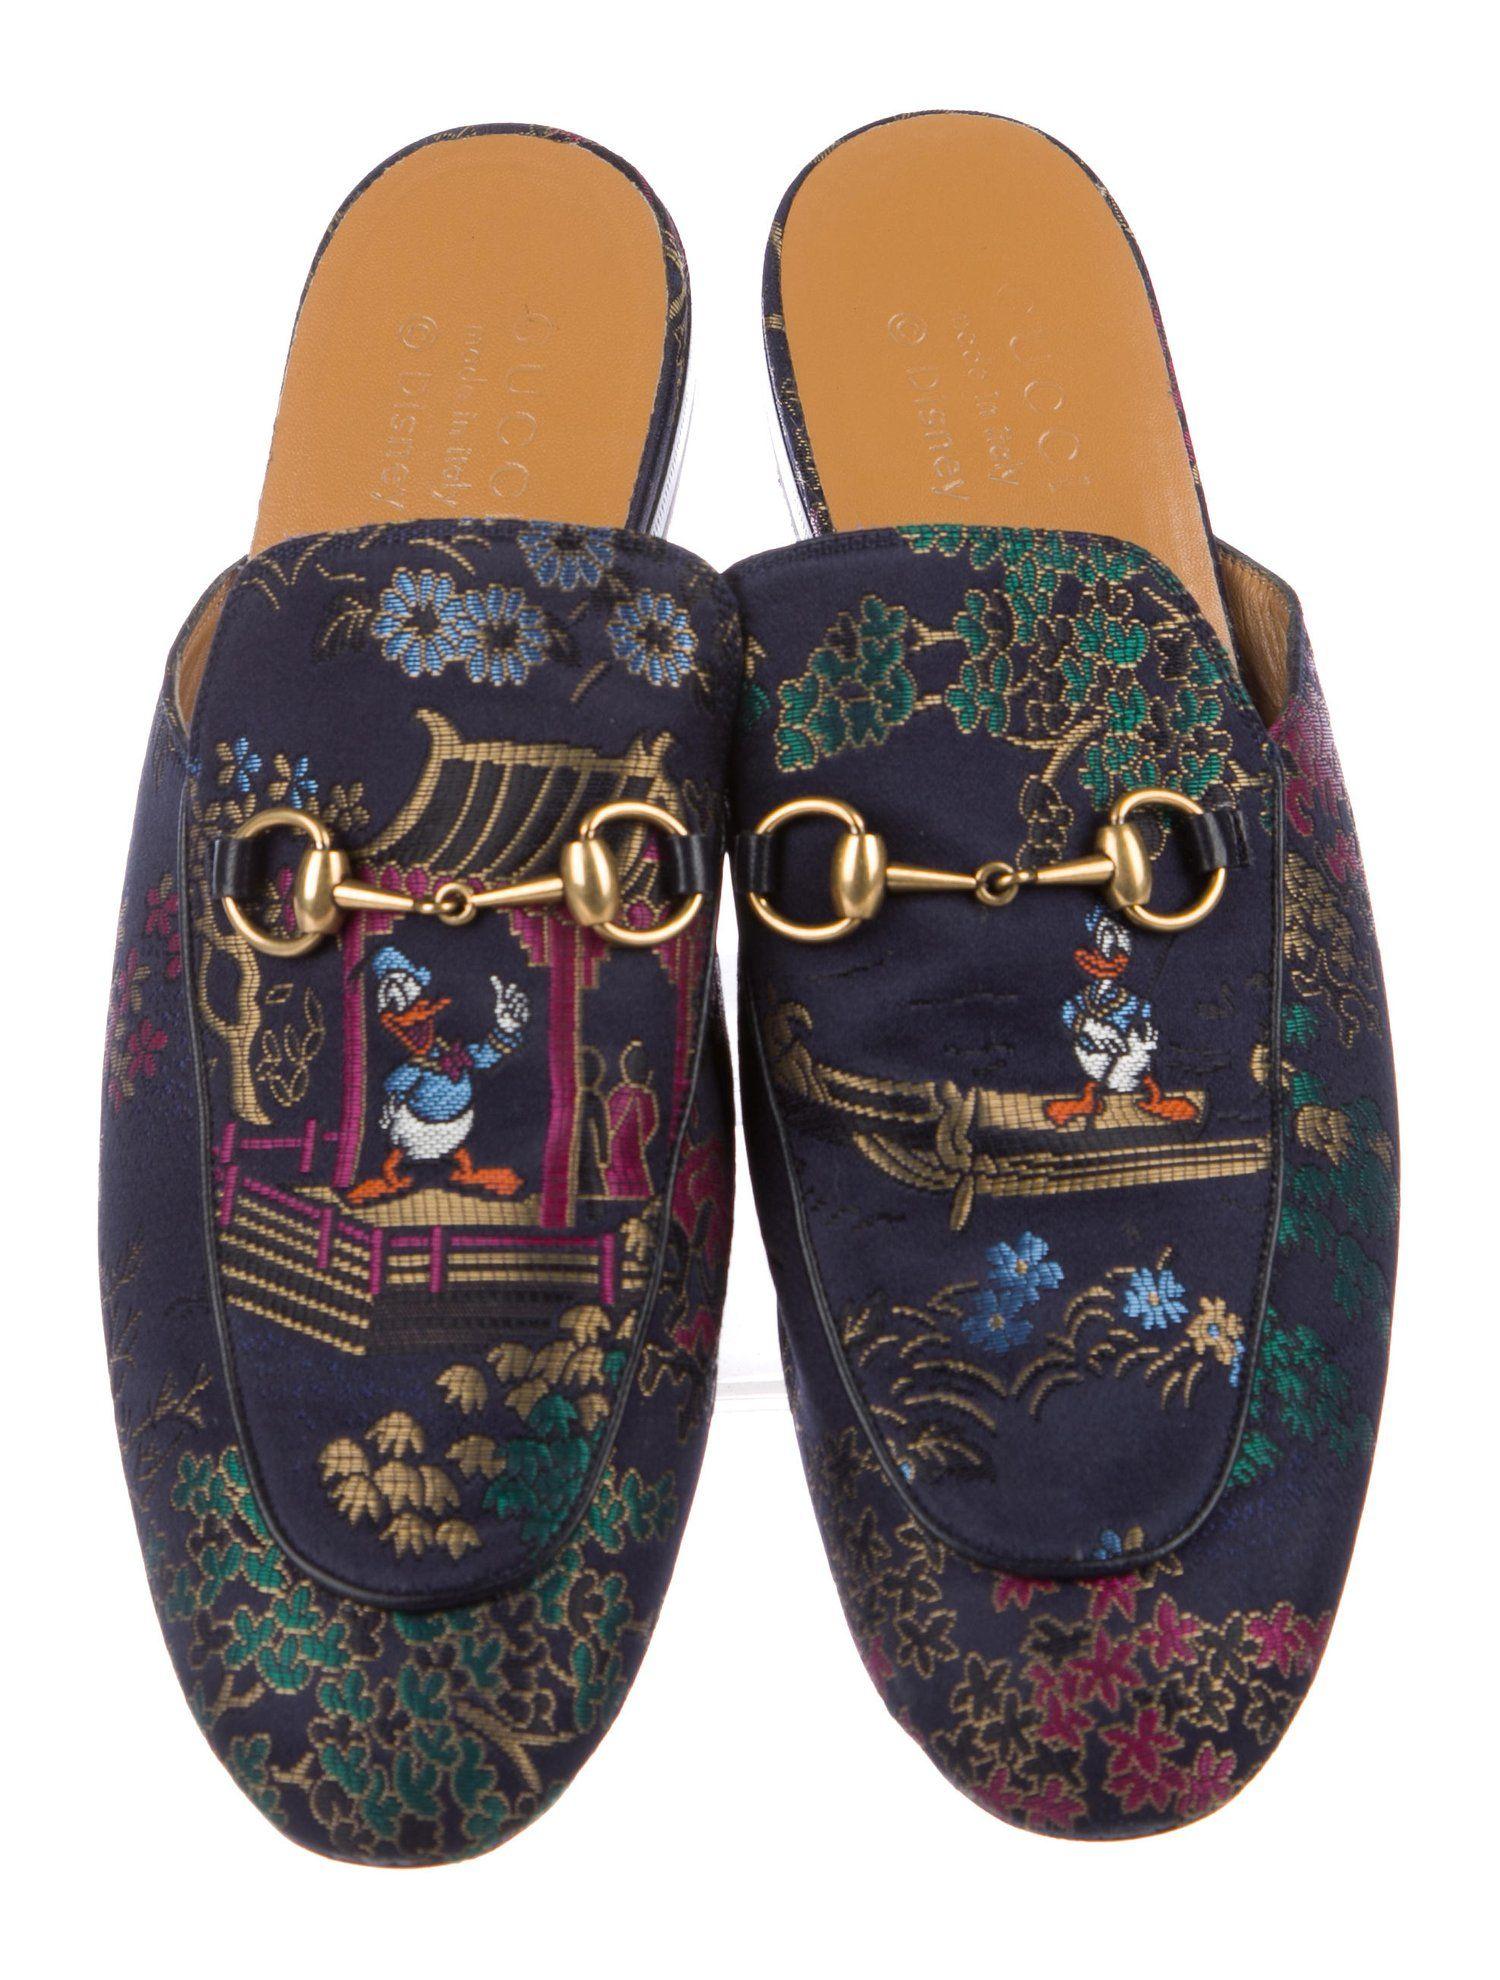 3bec2d35a Gucci x Disney 2017 Donald Duck Princetown Slippers #Disney #Gucci #Donald